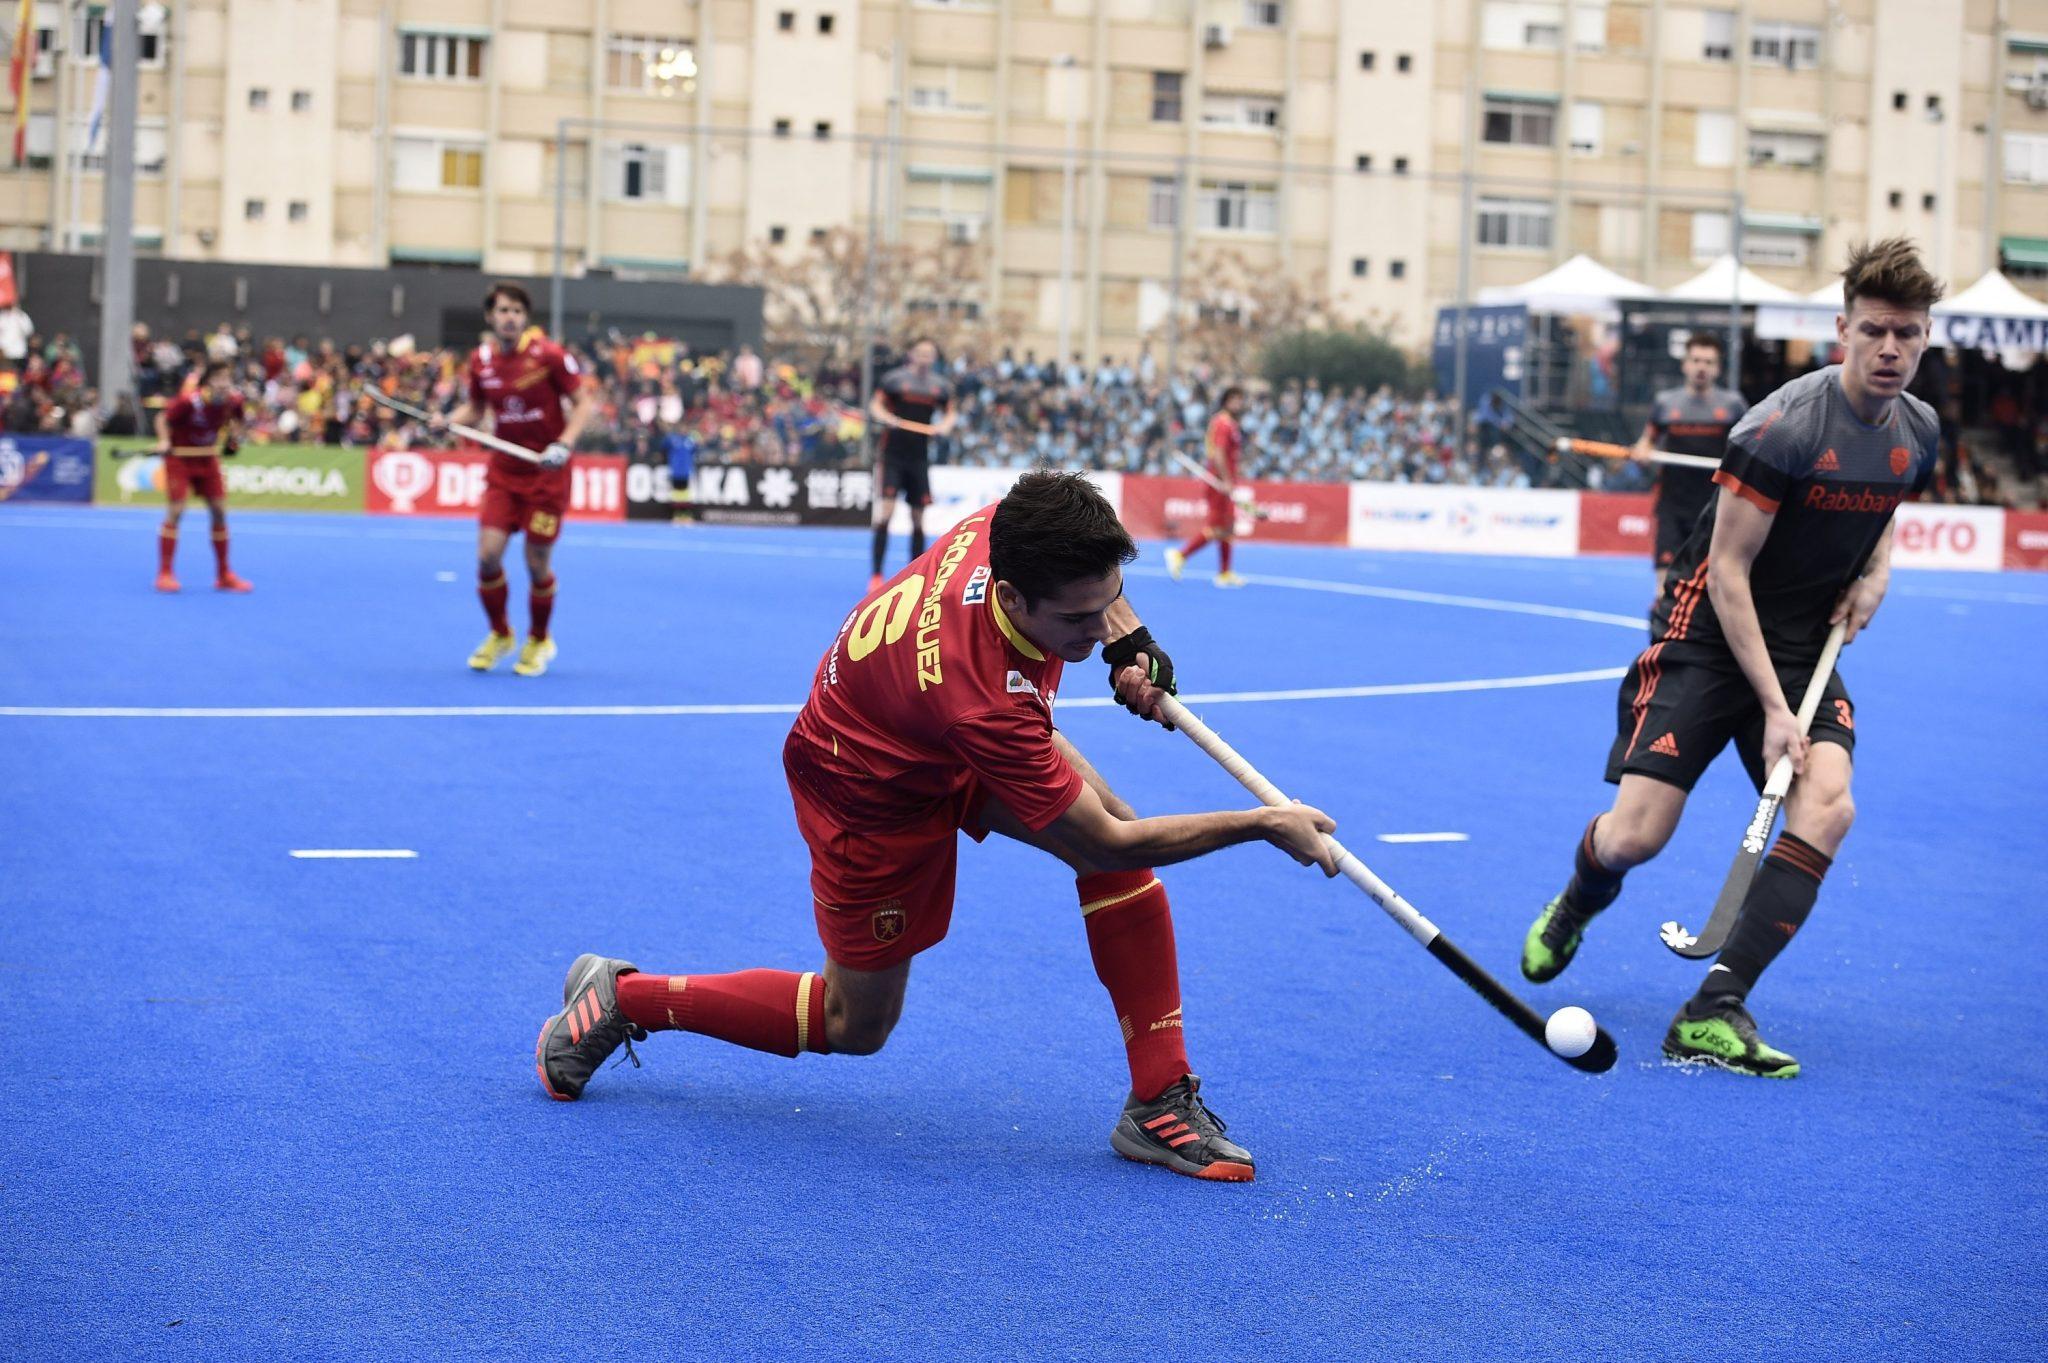 Spain hockey